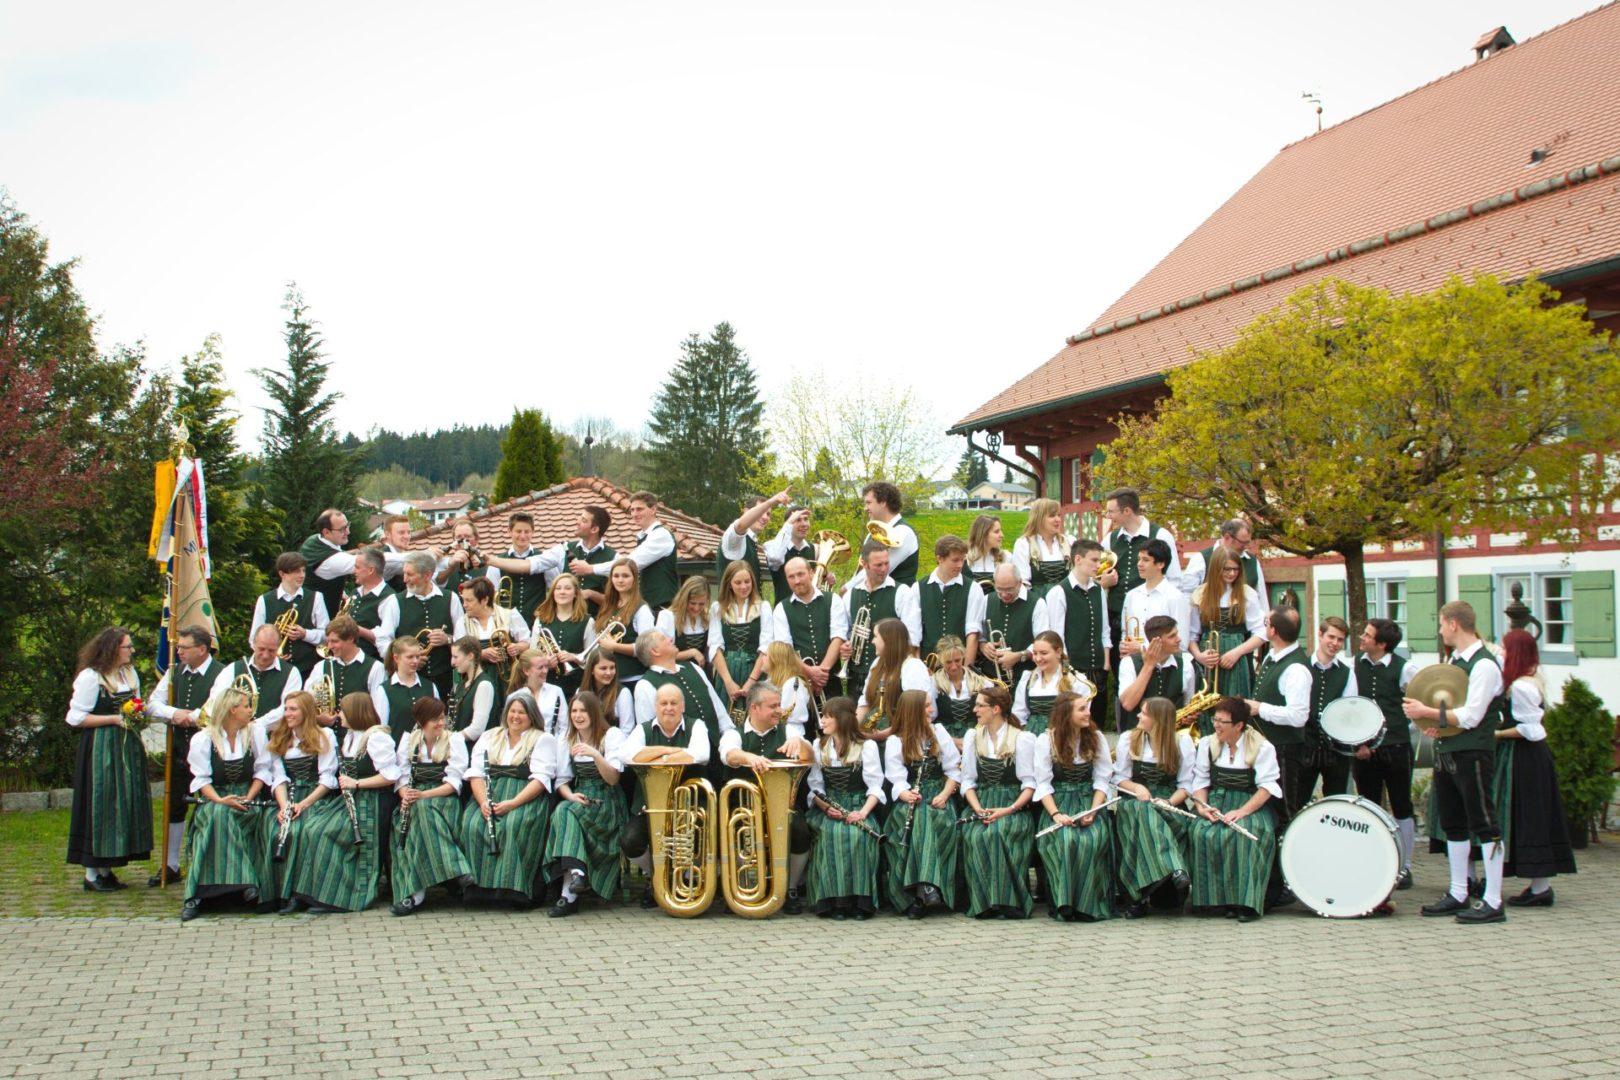 Wuchzenhofen